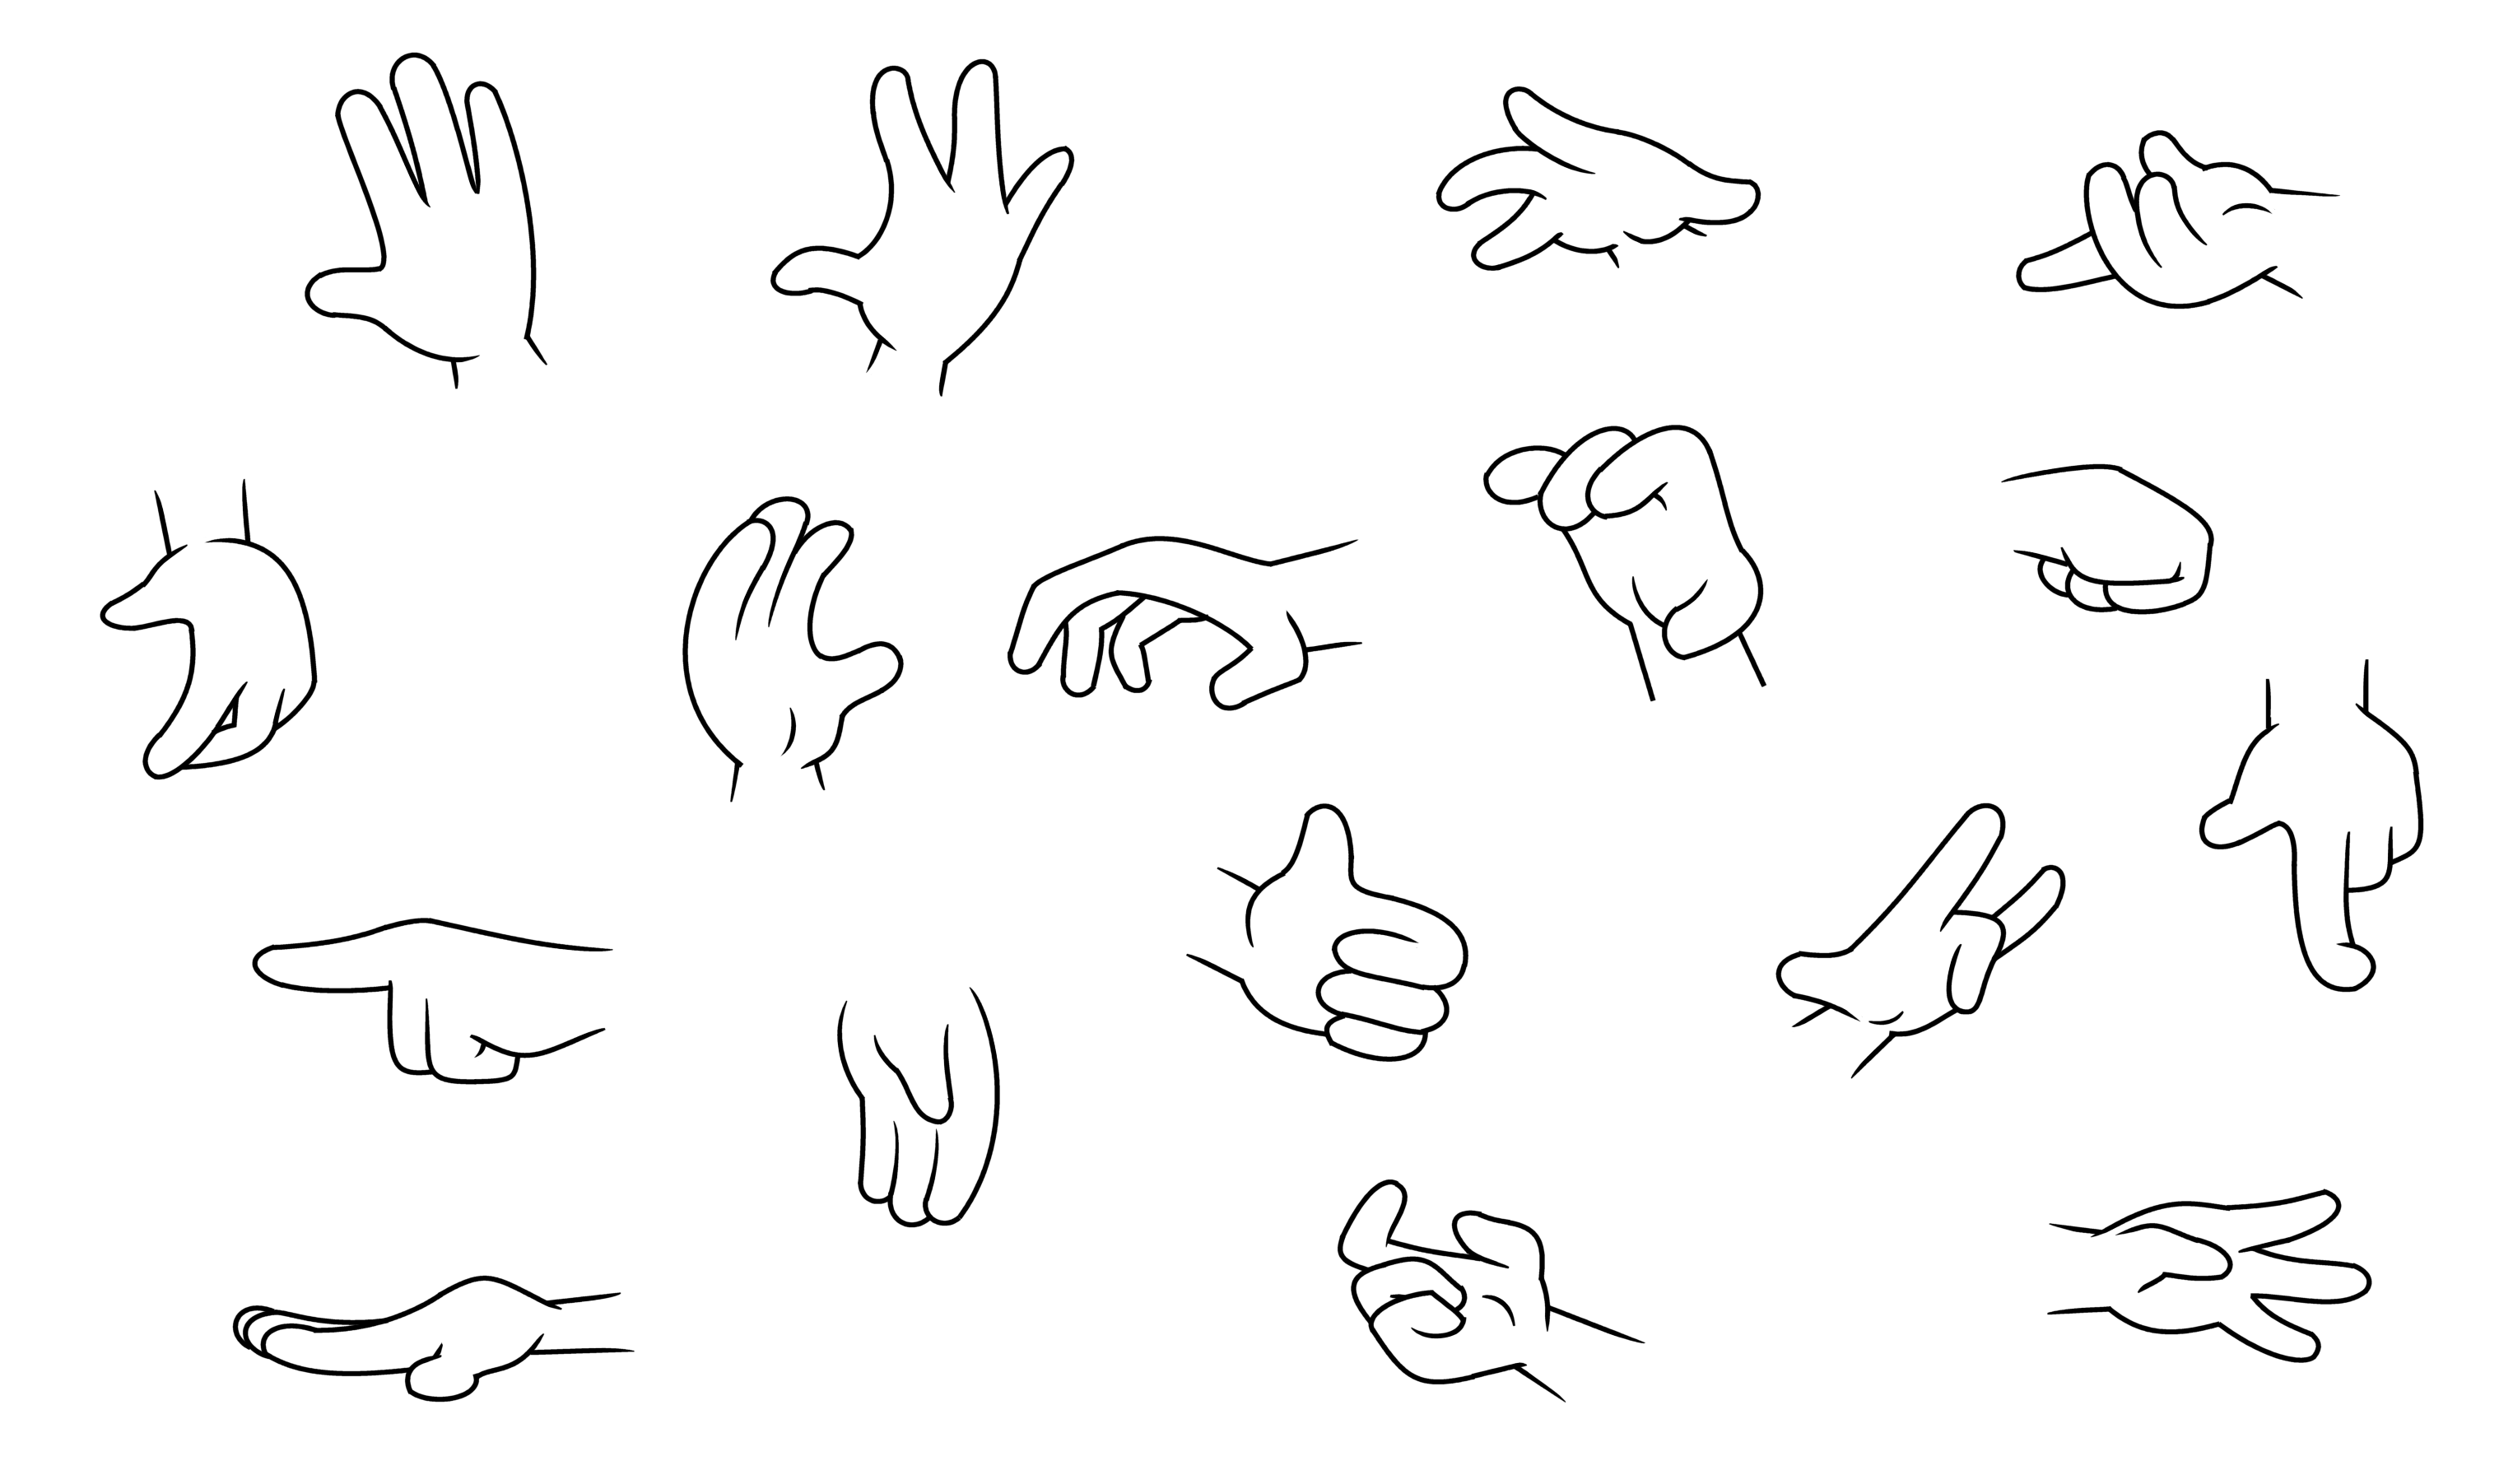 Cartoon Characters 3 Fingers : Four finger cartoon hands actions pinterest